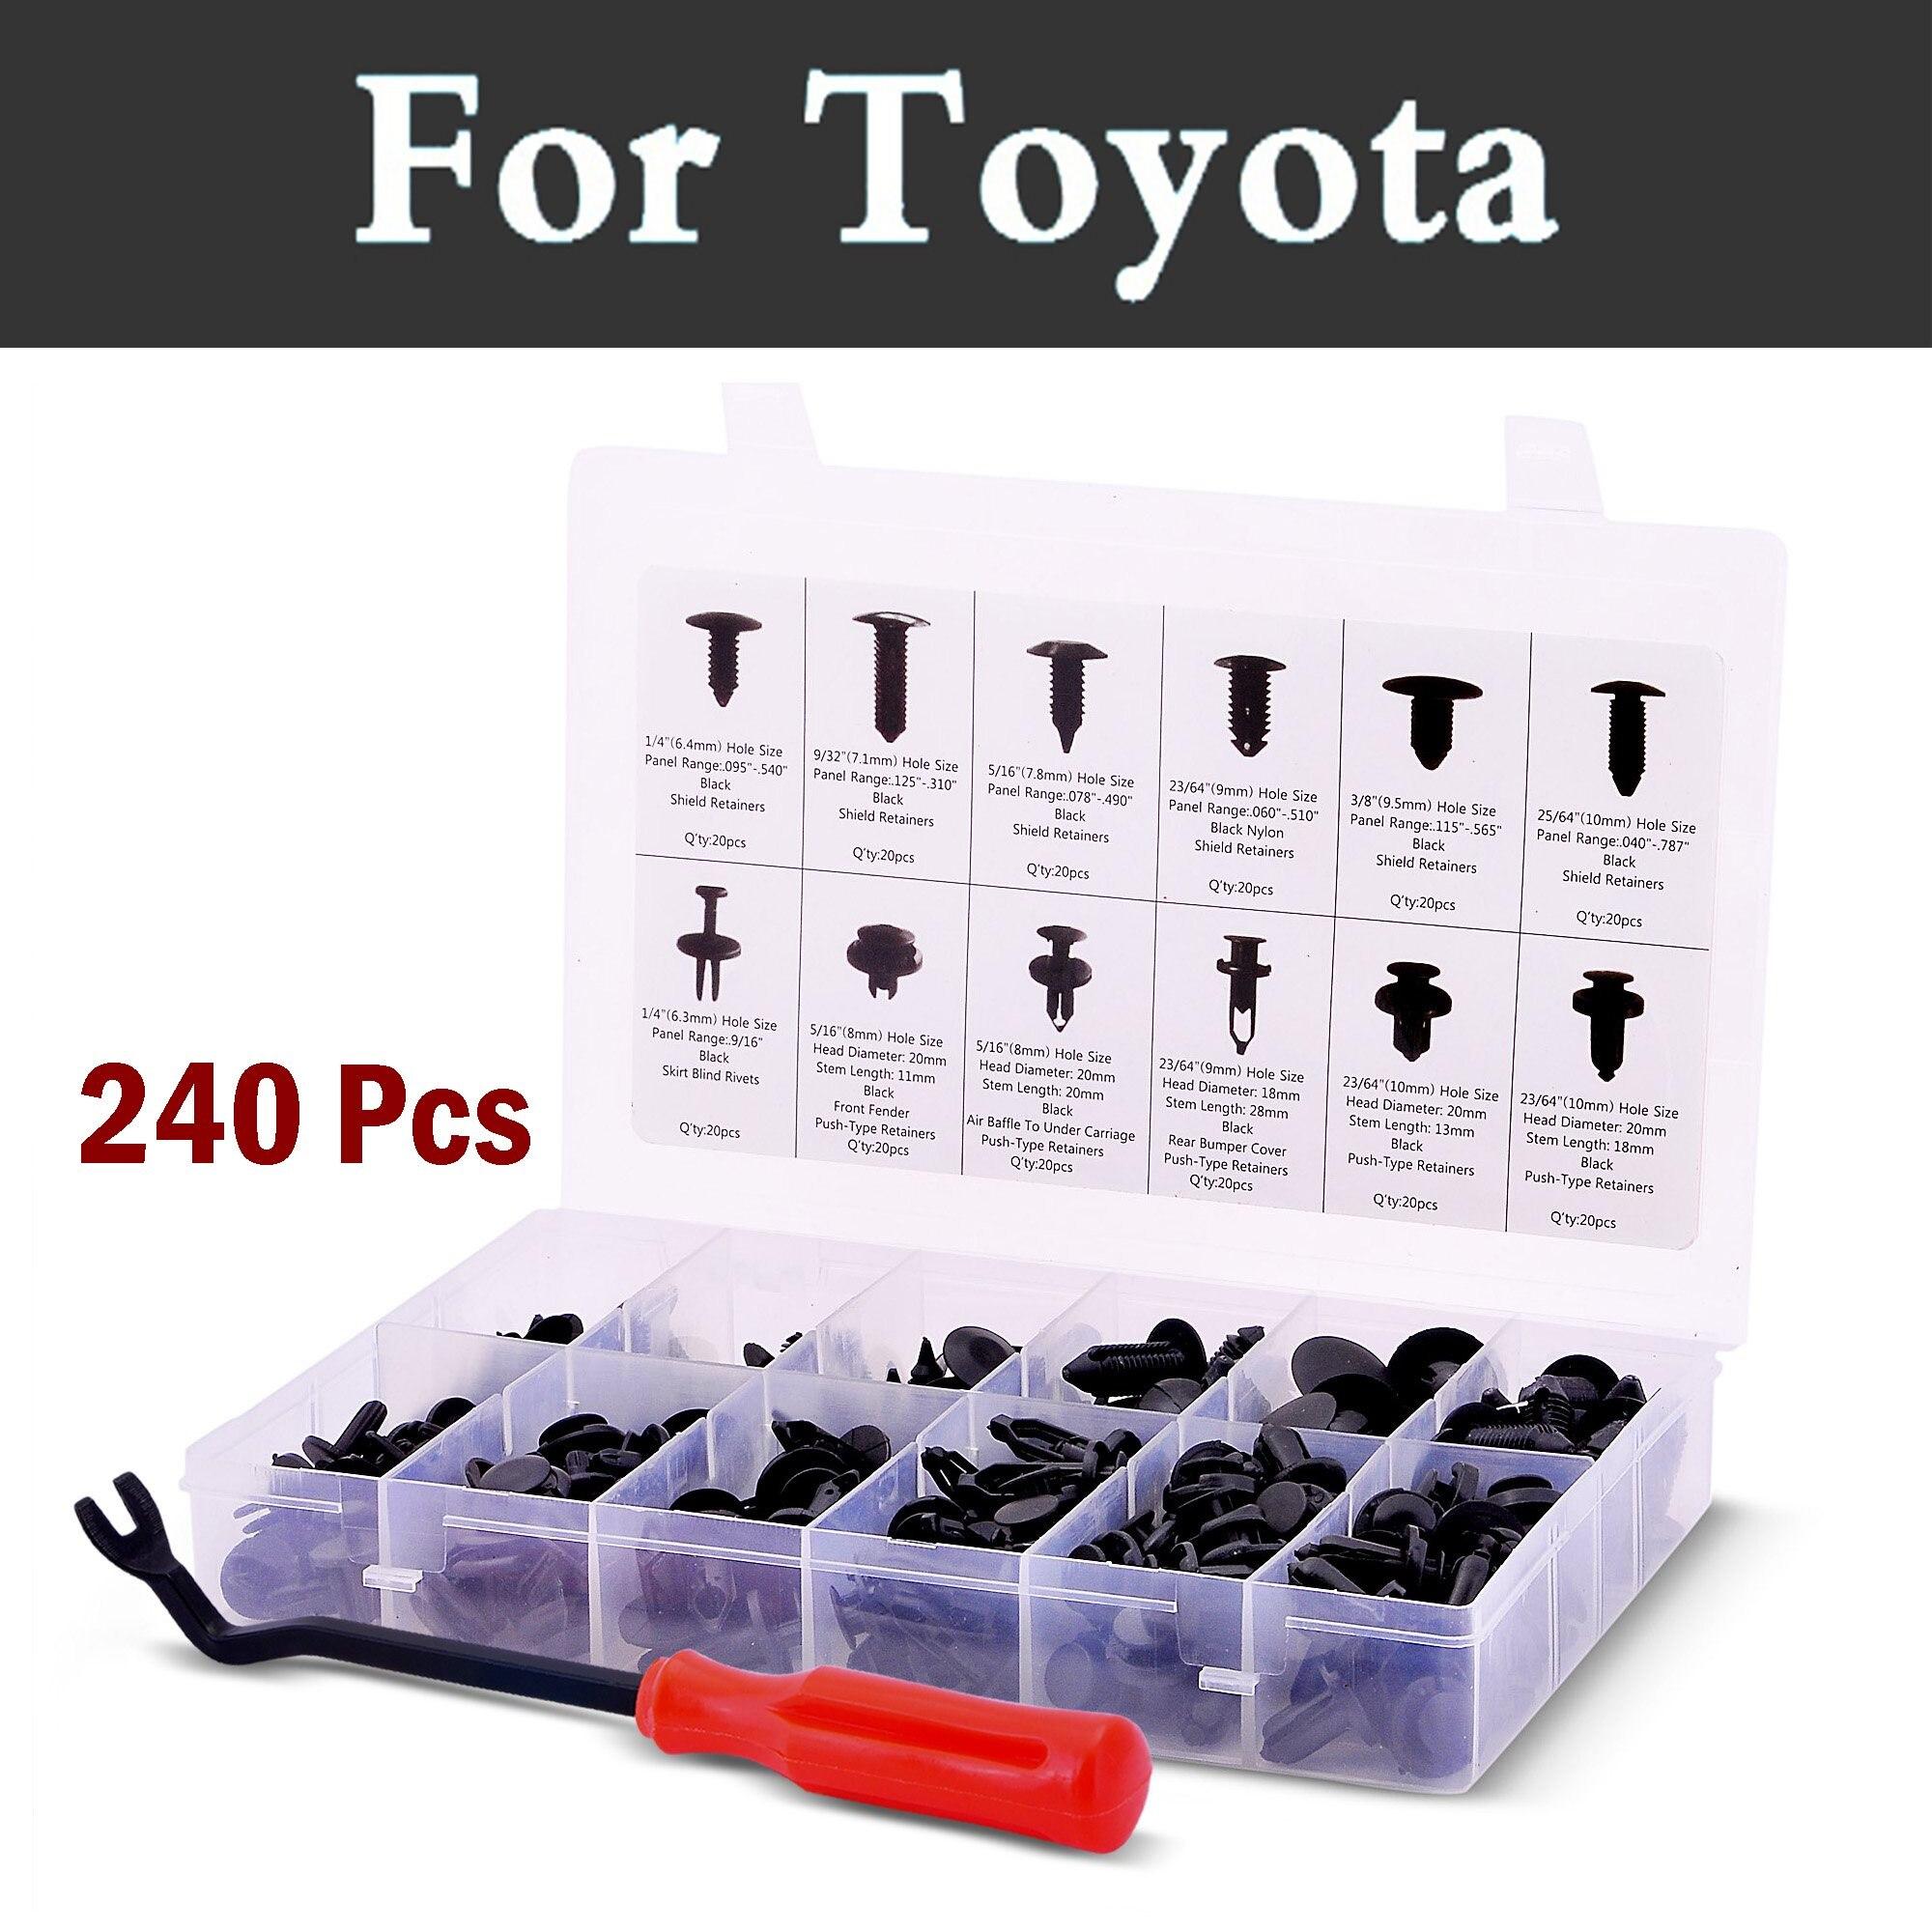 240x/conjunto de caja de plástico Auto Cuerpo Tipo de empuje retenedor de remaches para Toyota 4 runner Allex Allion aurion Auris Venza Avalon